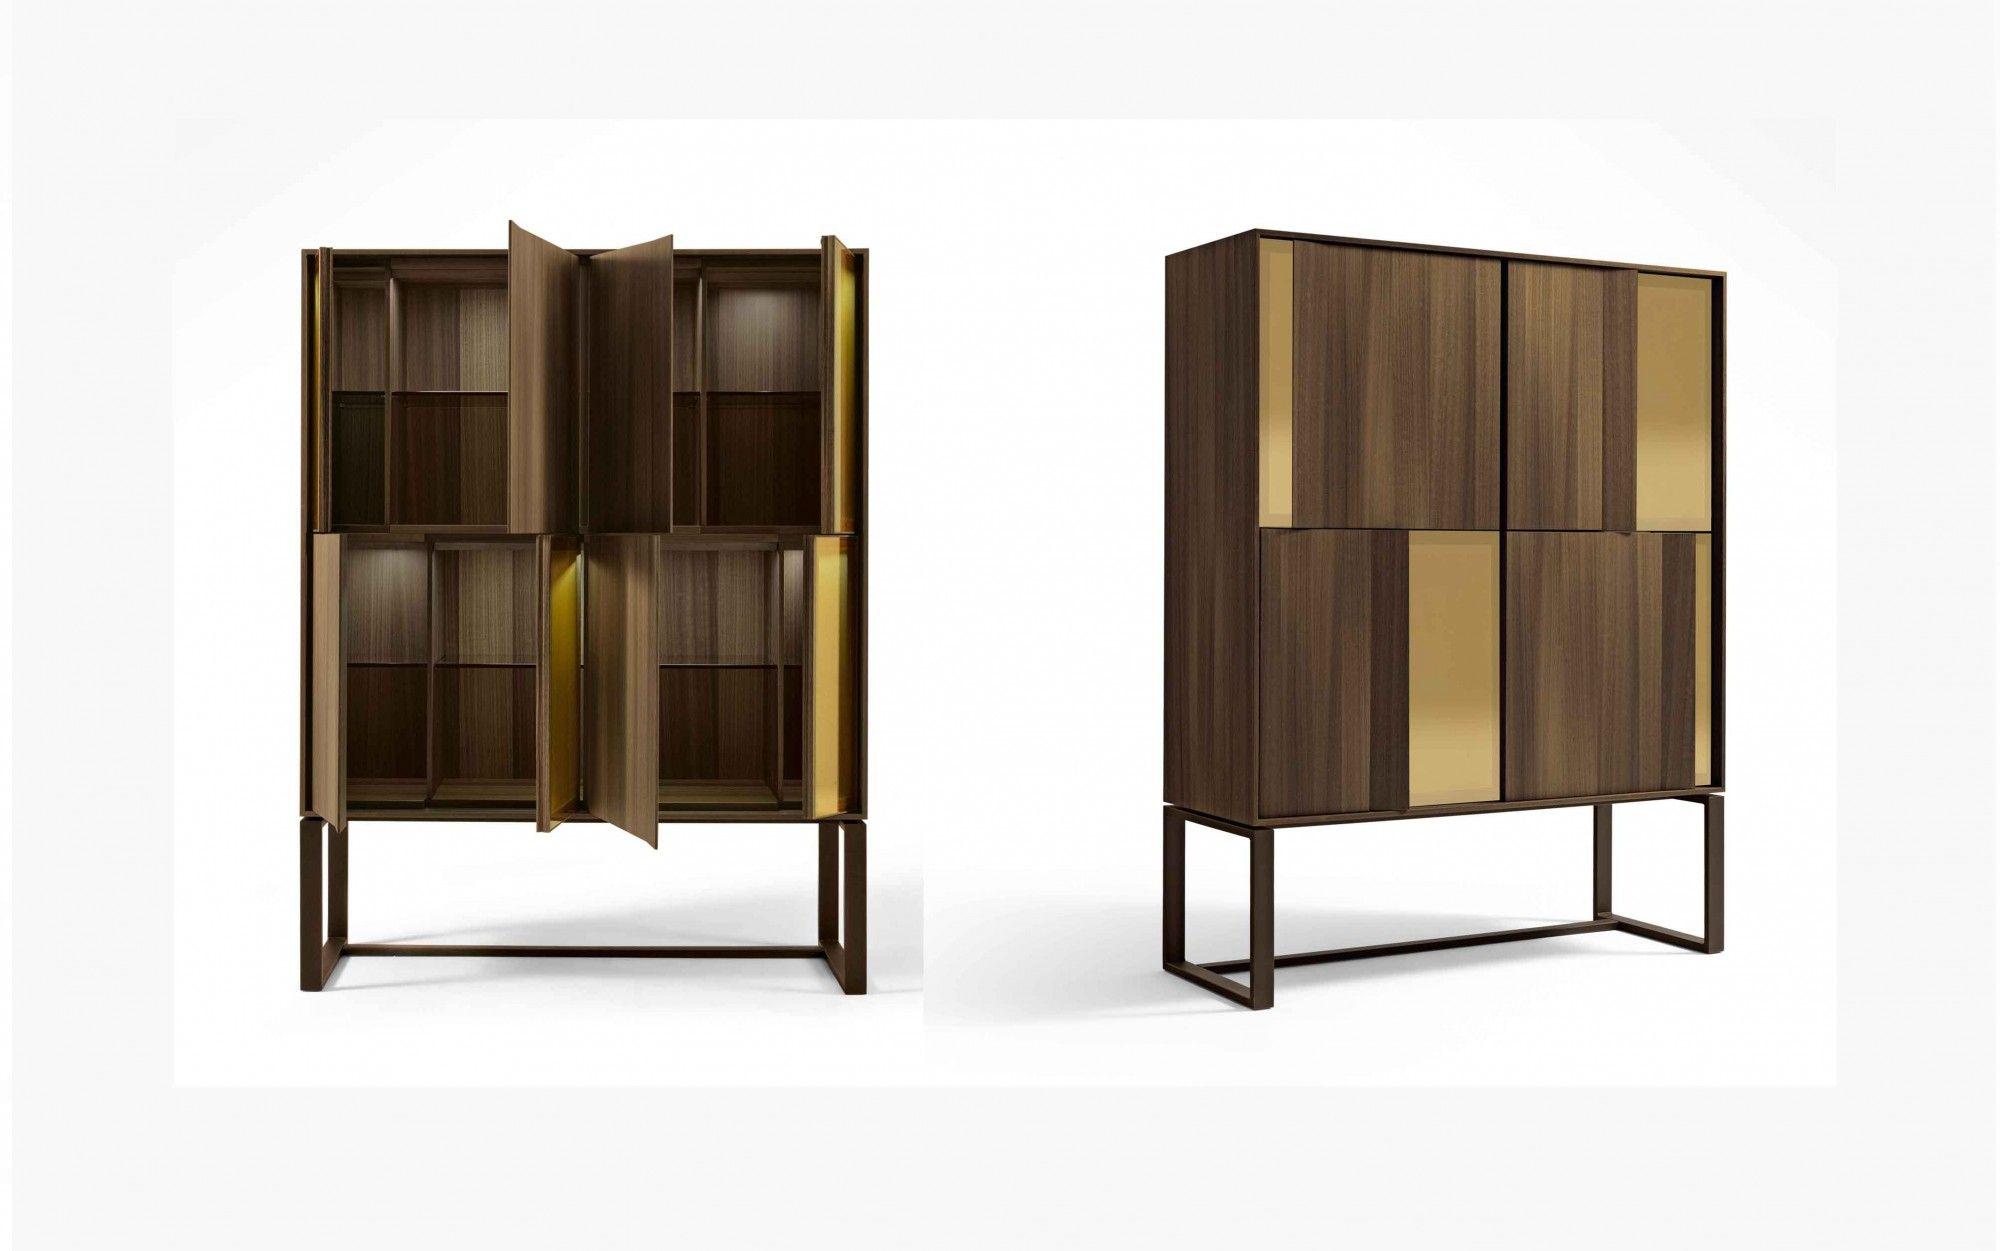 ORIGAMI by Massimo Castagna Unique furniture